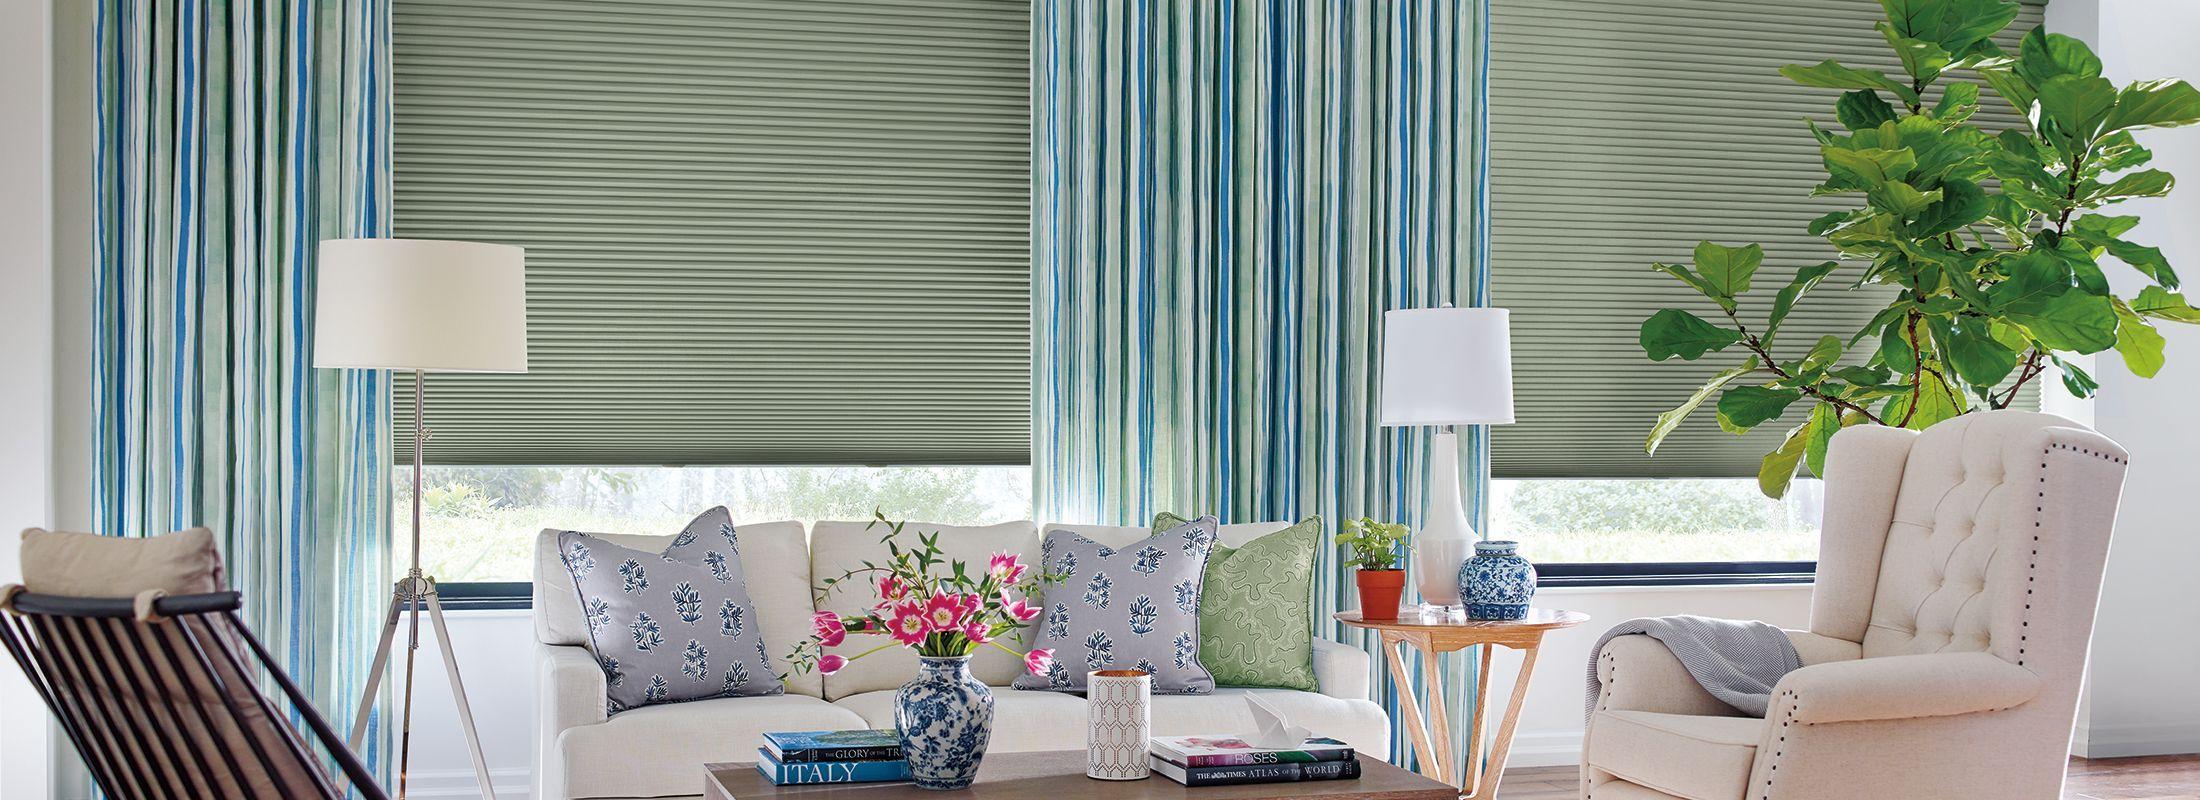 Design Studio Side Panels Fabric in Garden Stripe Green/Blue